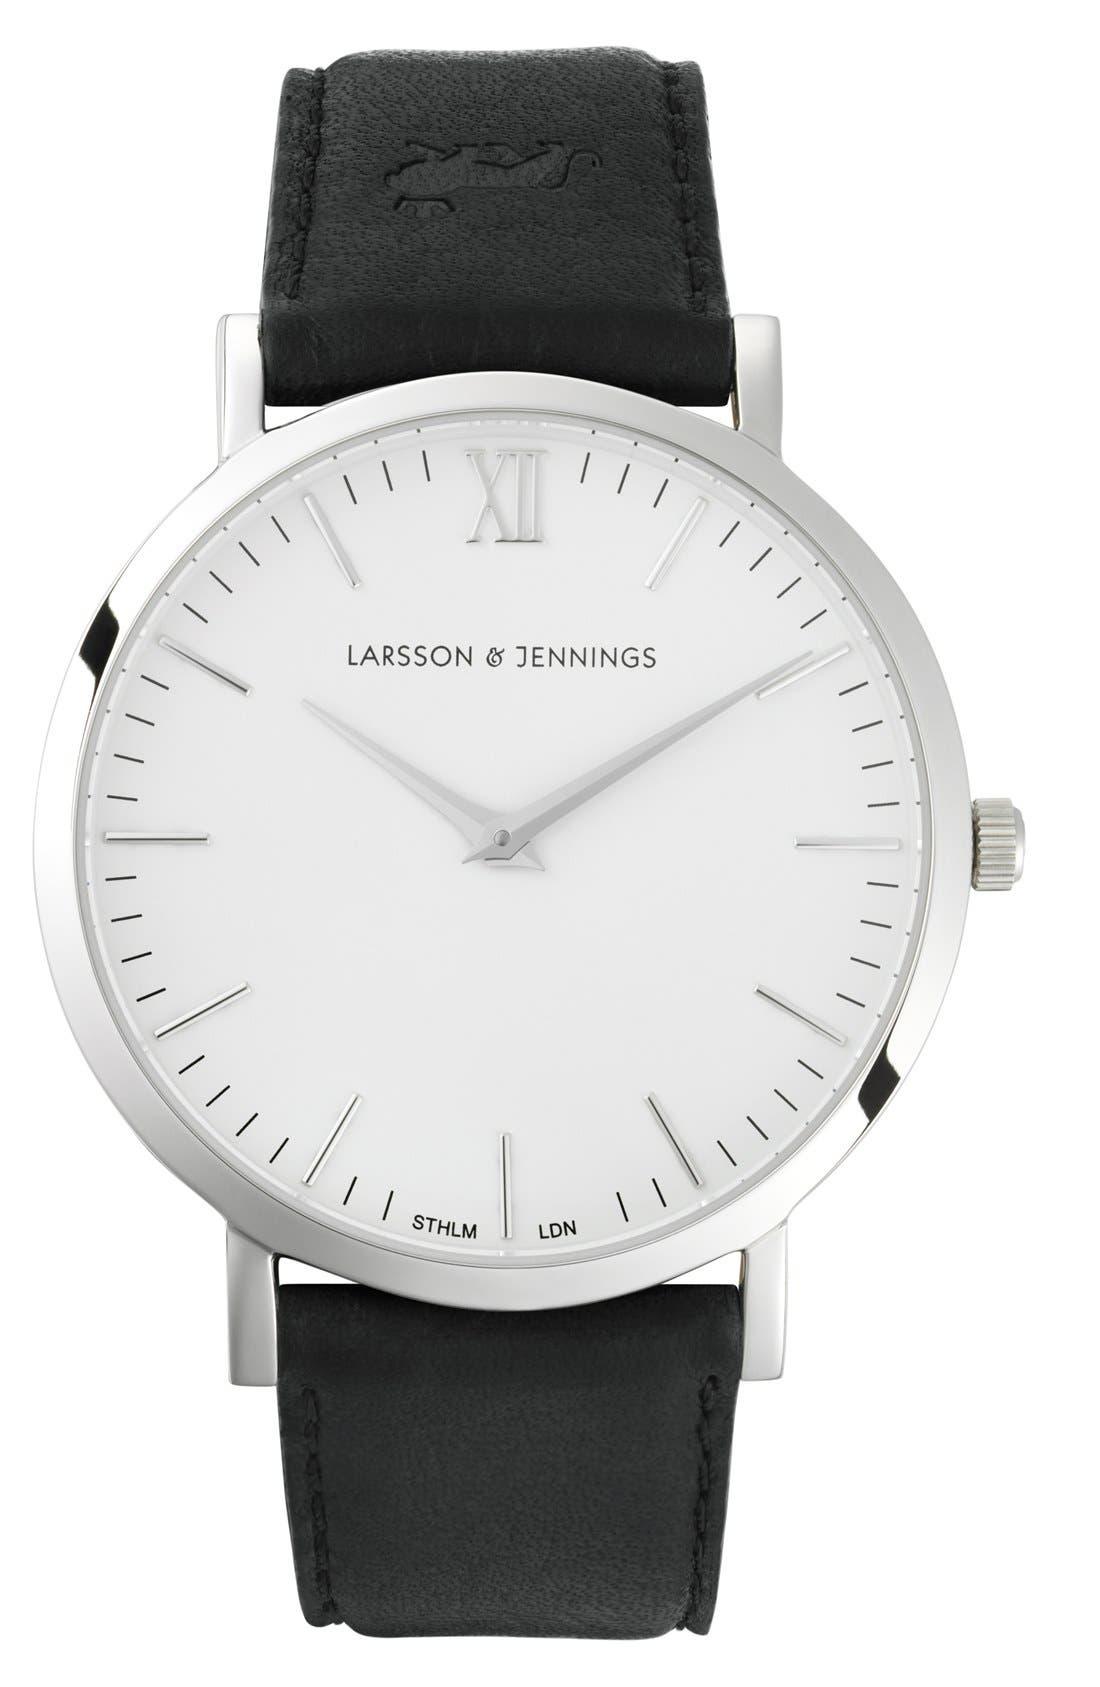 Larsson & Jennings 'Lugano' Leather Strap Watch, 40mm